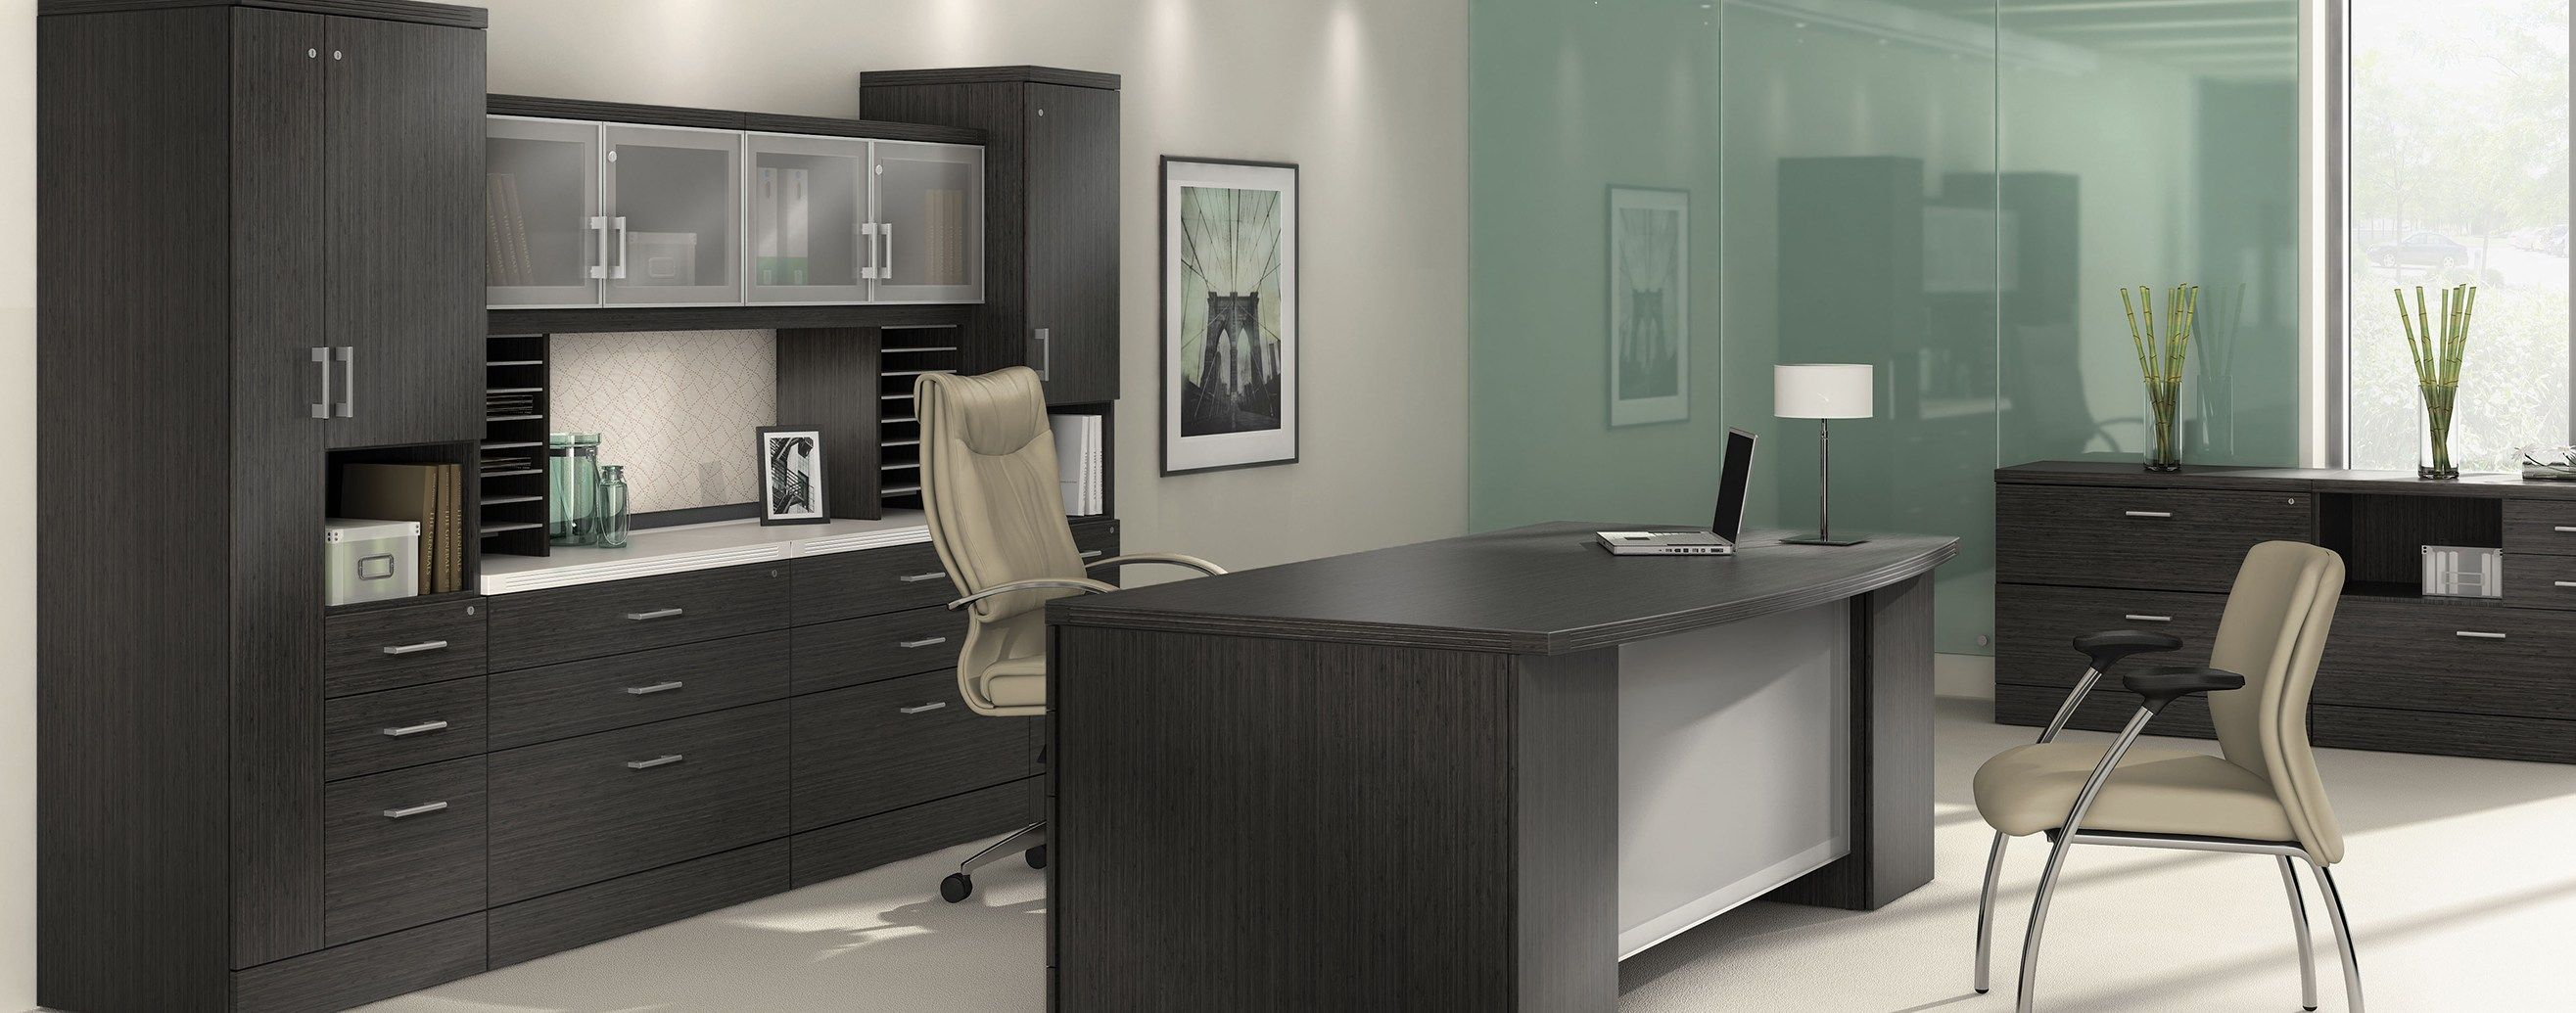 Pics Of Office Furniture Buy Sprintz Furniture Home Metro Office Environments Office Furniture Design Office Furniture Design Furniture Design Office Furniture Uk